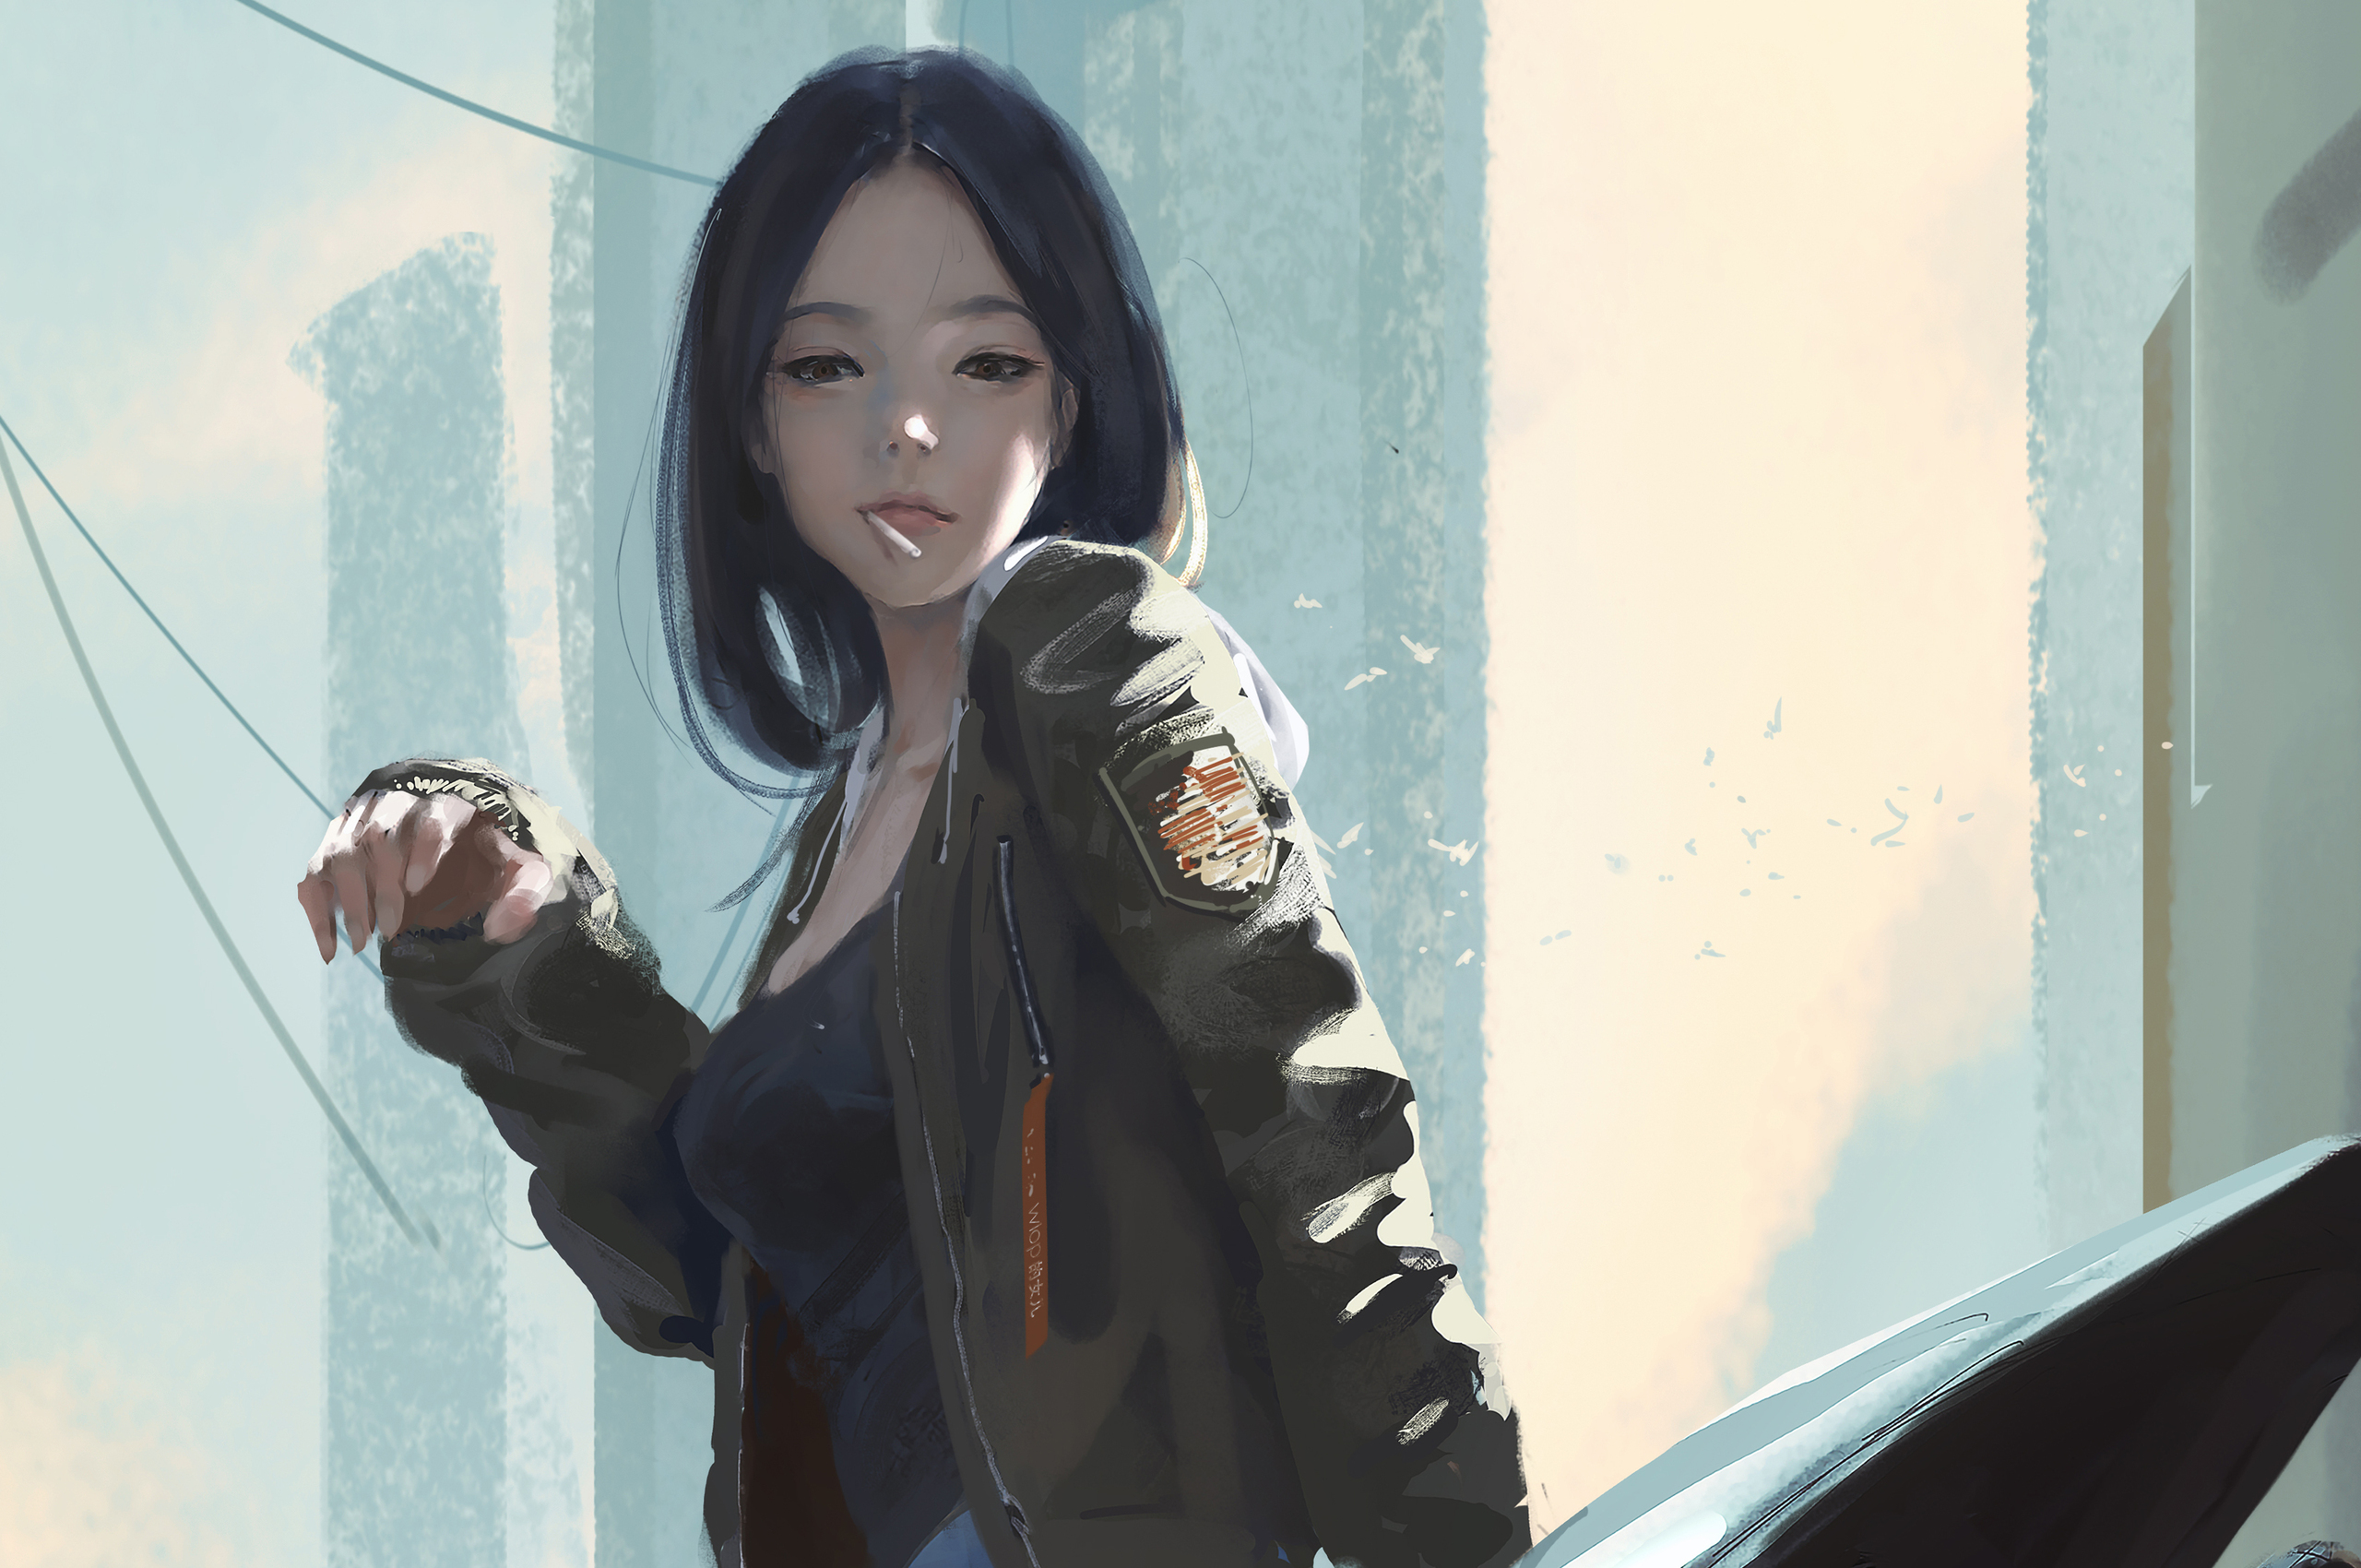 urban-girl-smoking-cigarette-gs.jpg